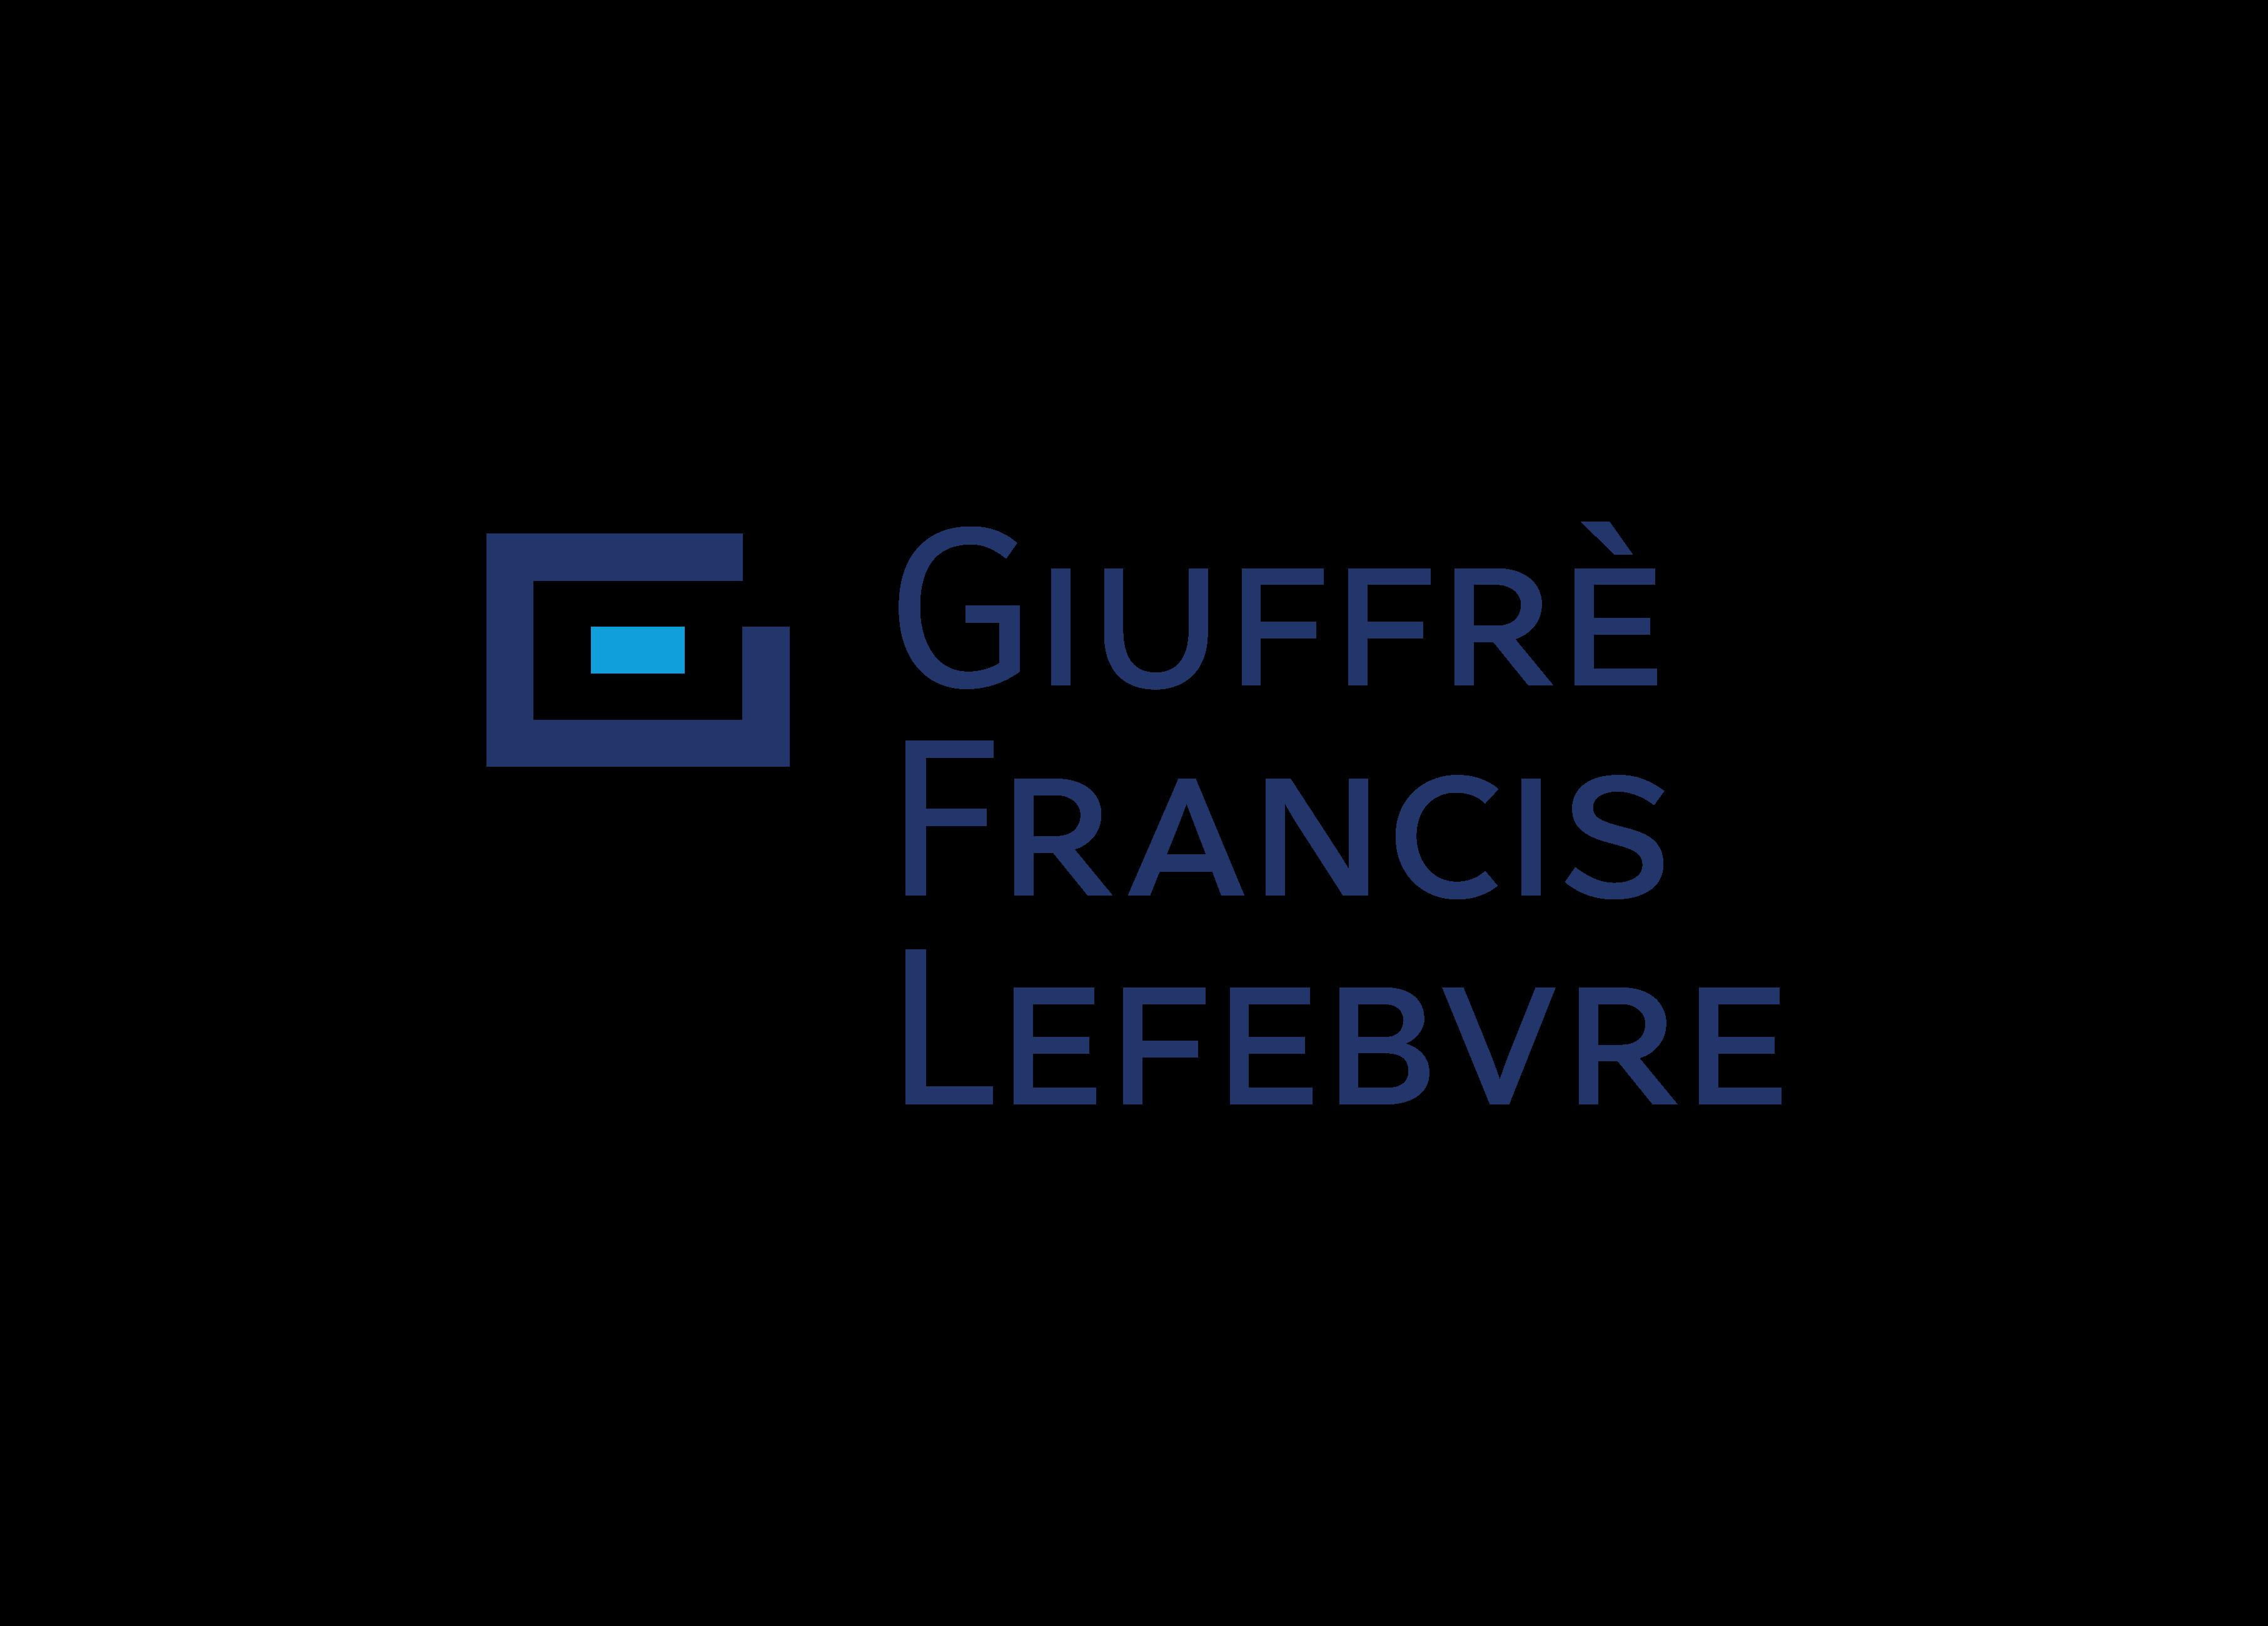 Giuffrè Francis Lafebvre